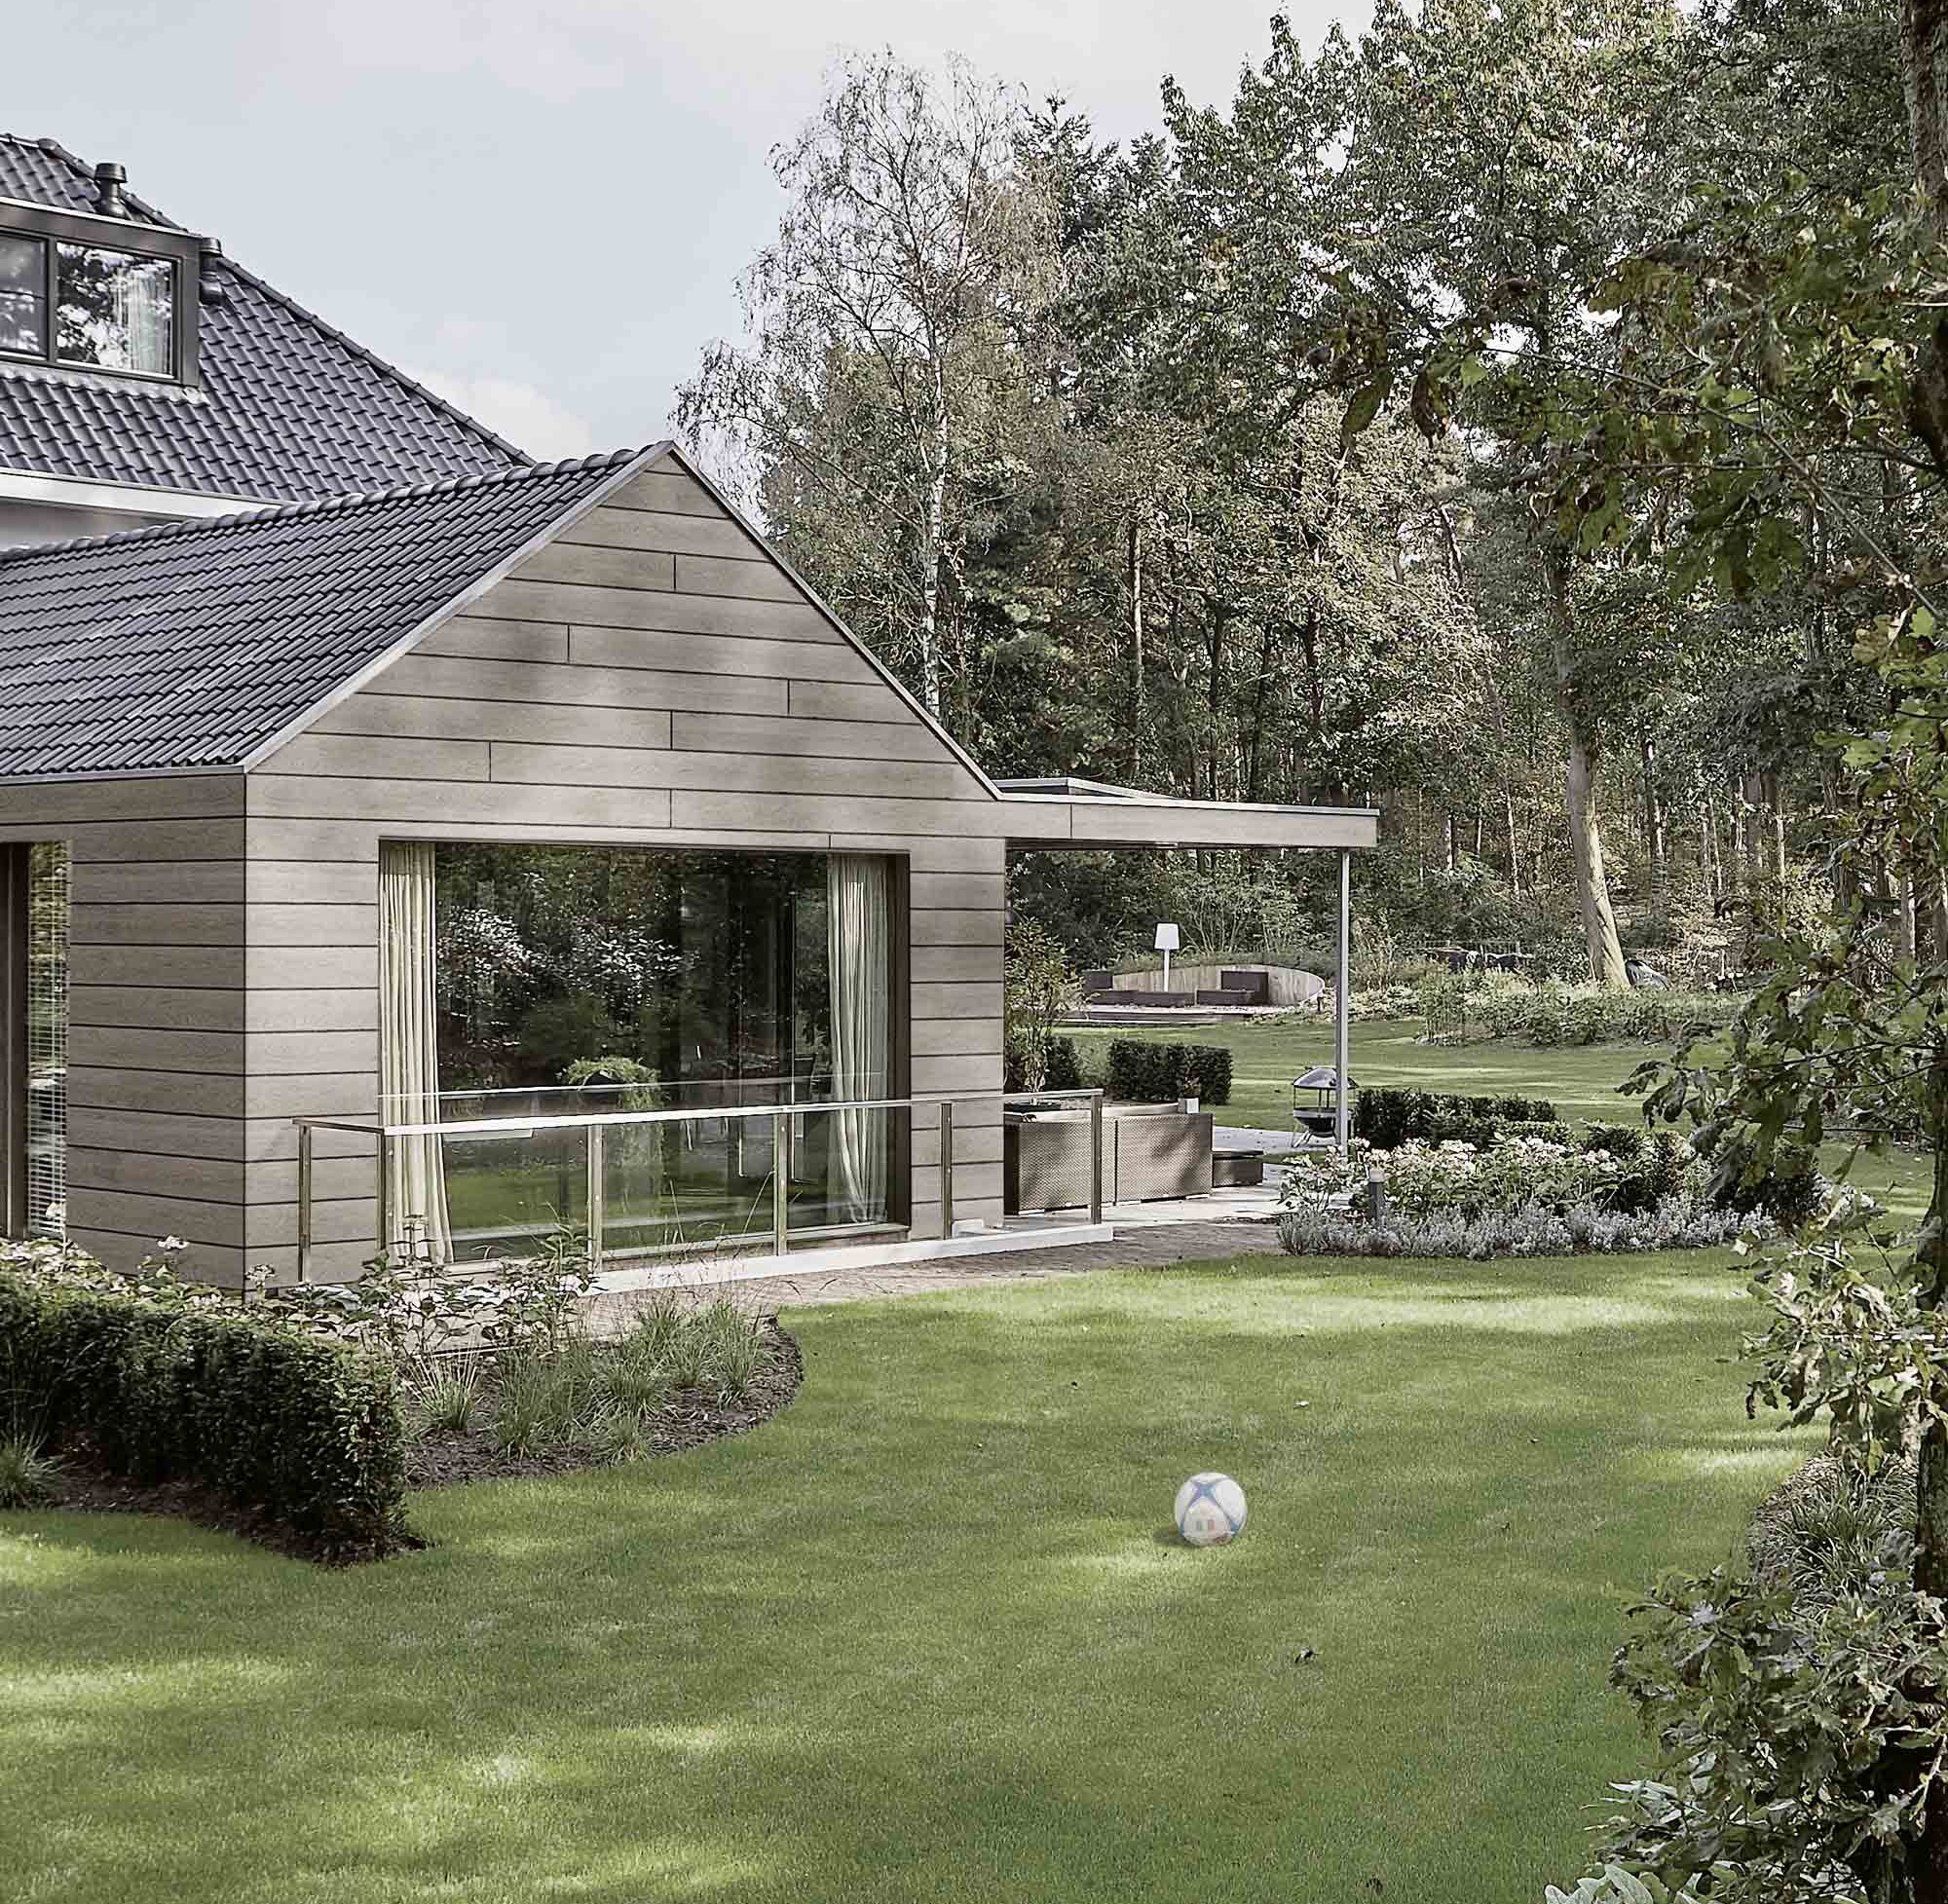 Kunststofffassade im Country Style – HolzLand Verbeek